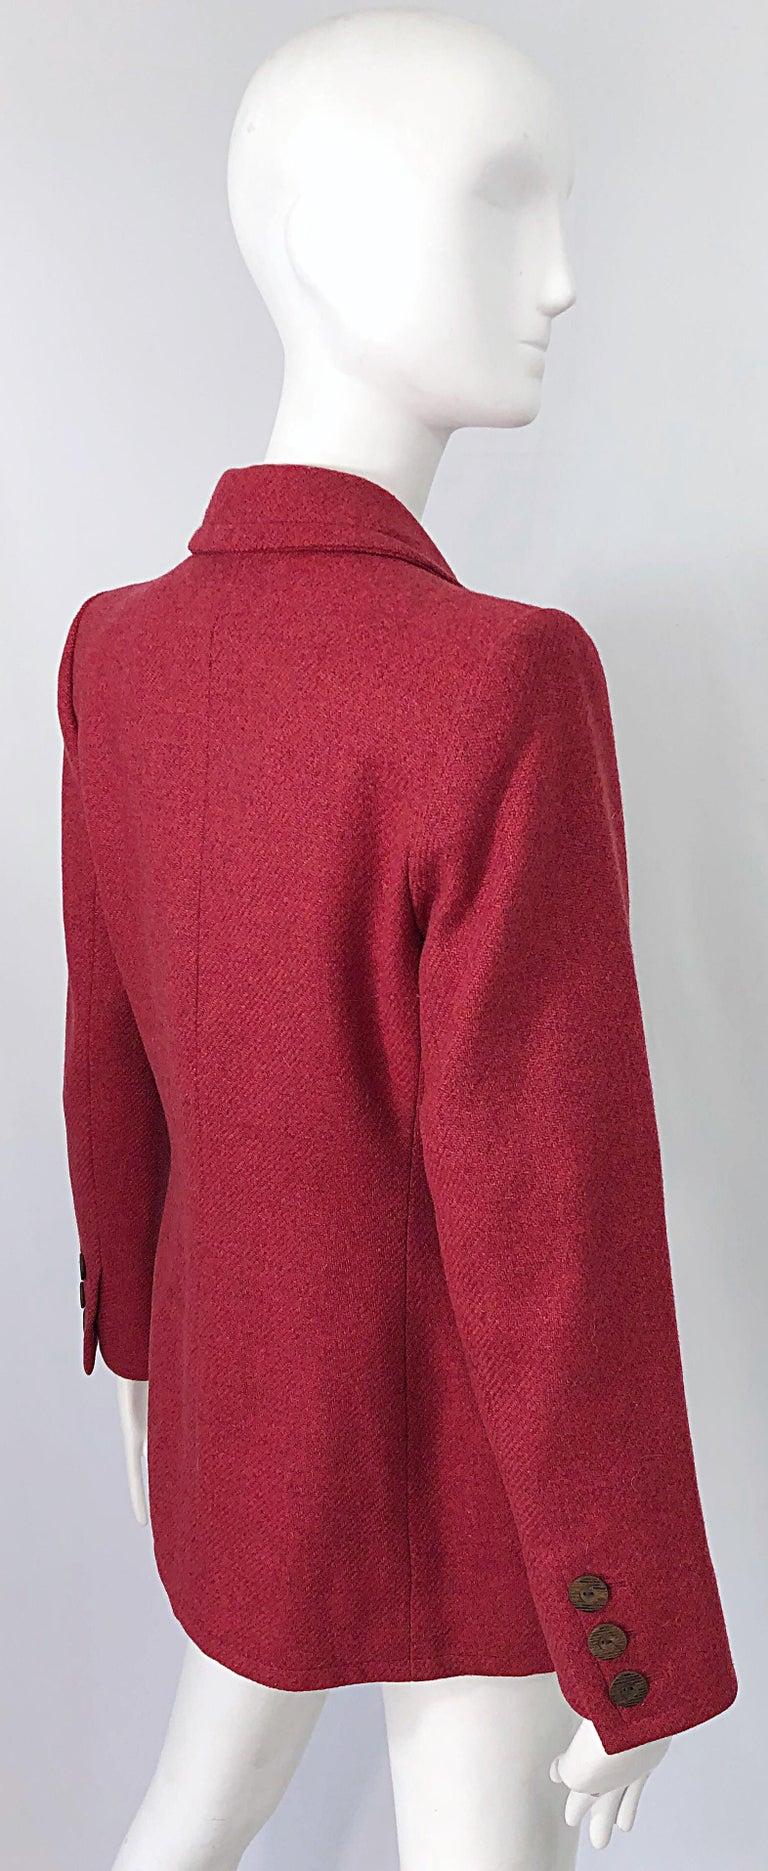 Vintage Yves Saint Laurent 1990s Raspberry Pink Classic 90s Blazer Jacket YSL For Sale 1